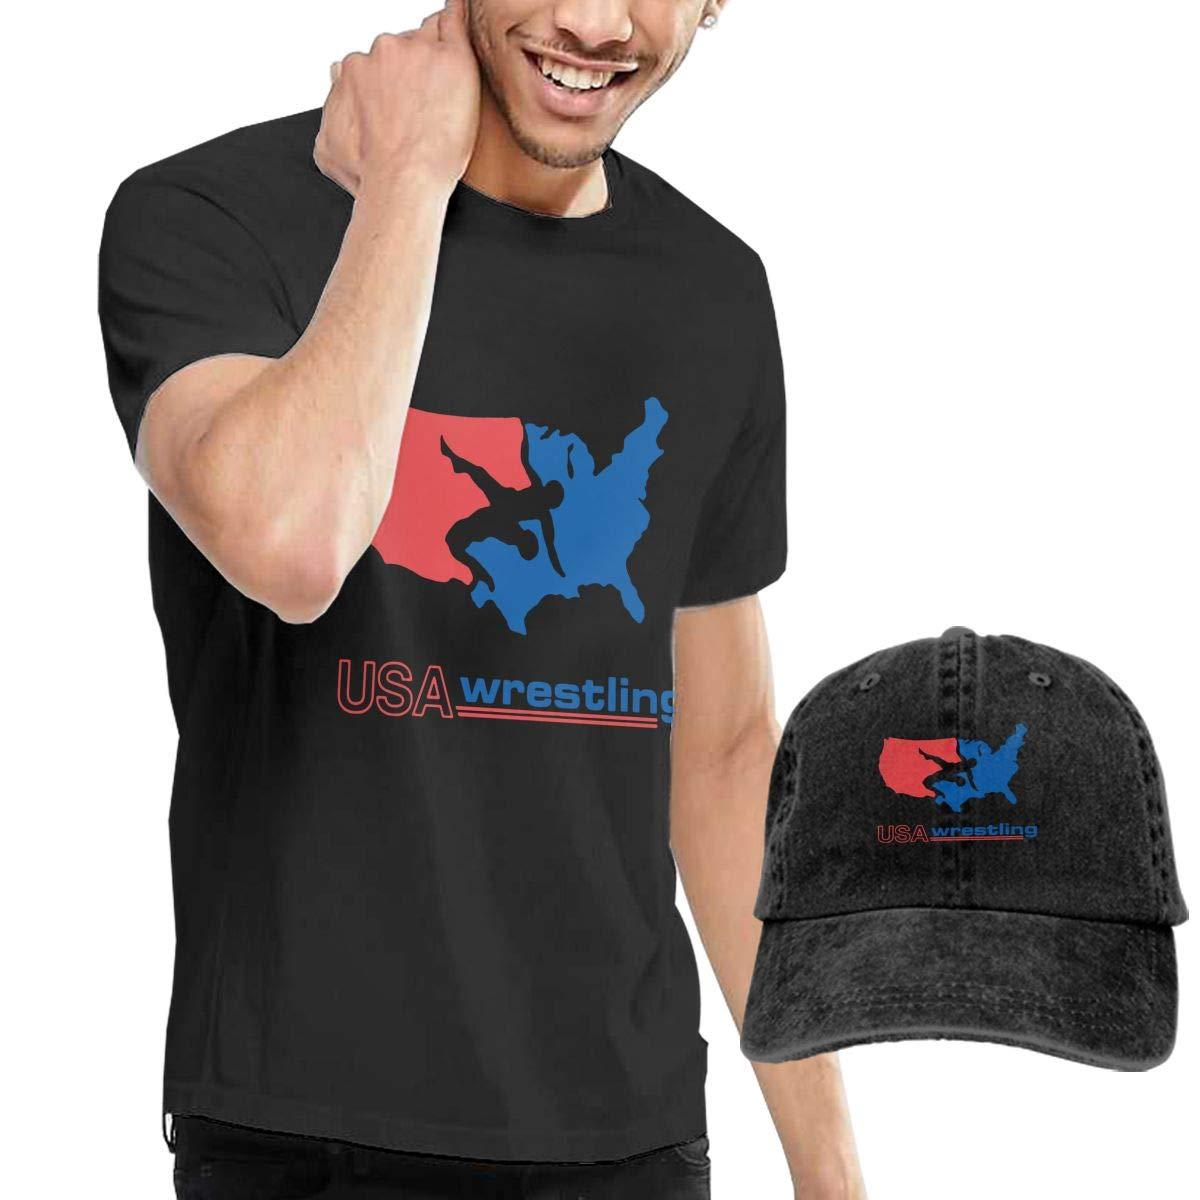 WWTBBJ-B USA Wrestling Adult Mens Casual T Shirts and Running Jean Headgear